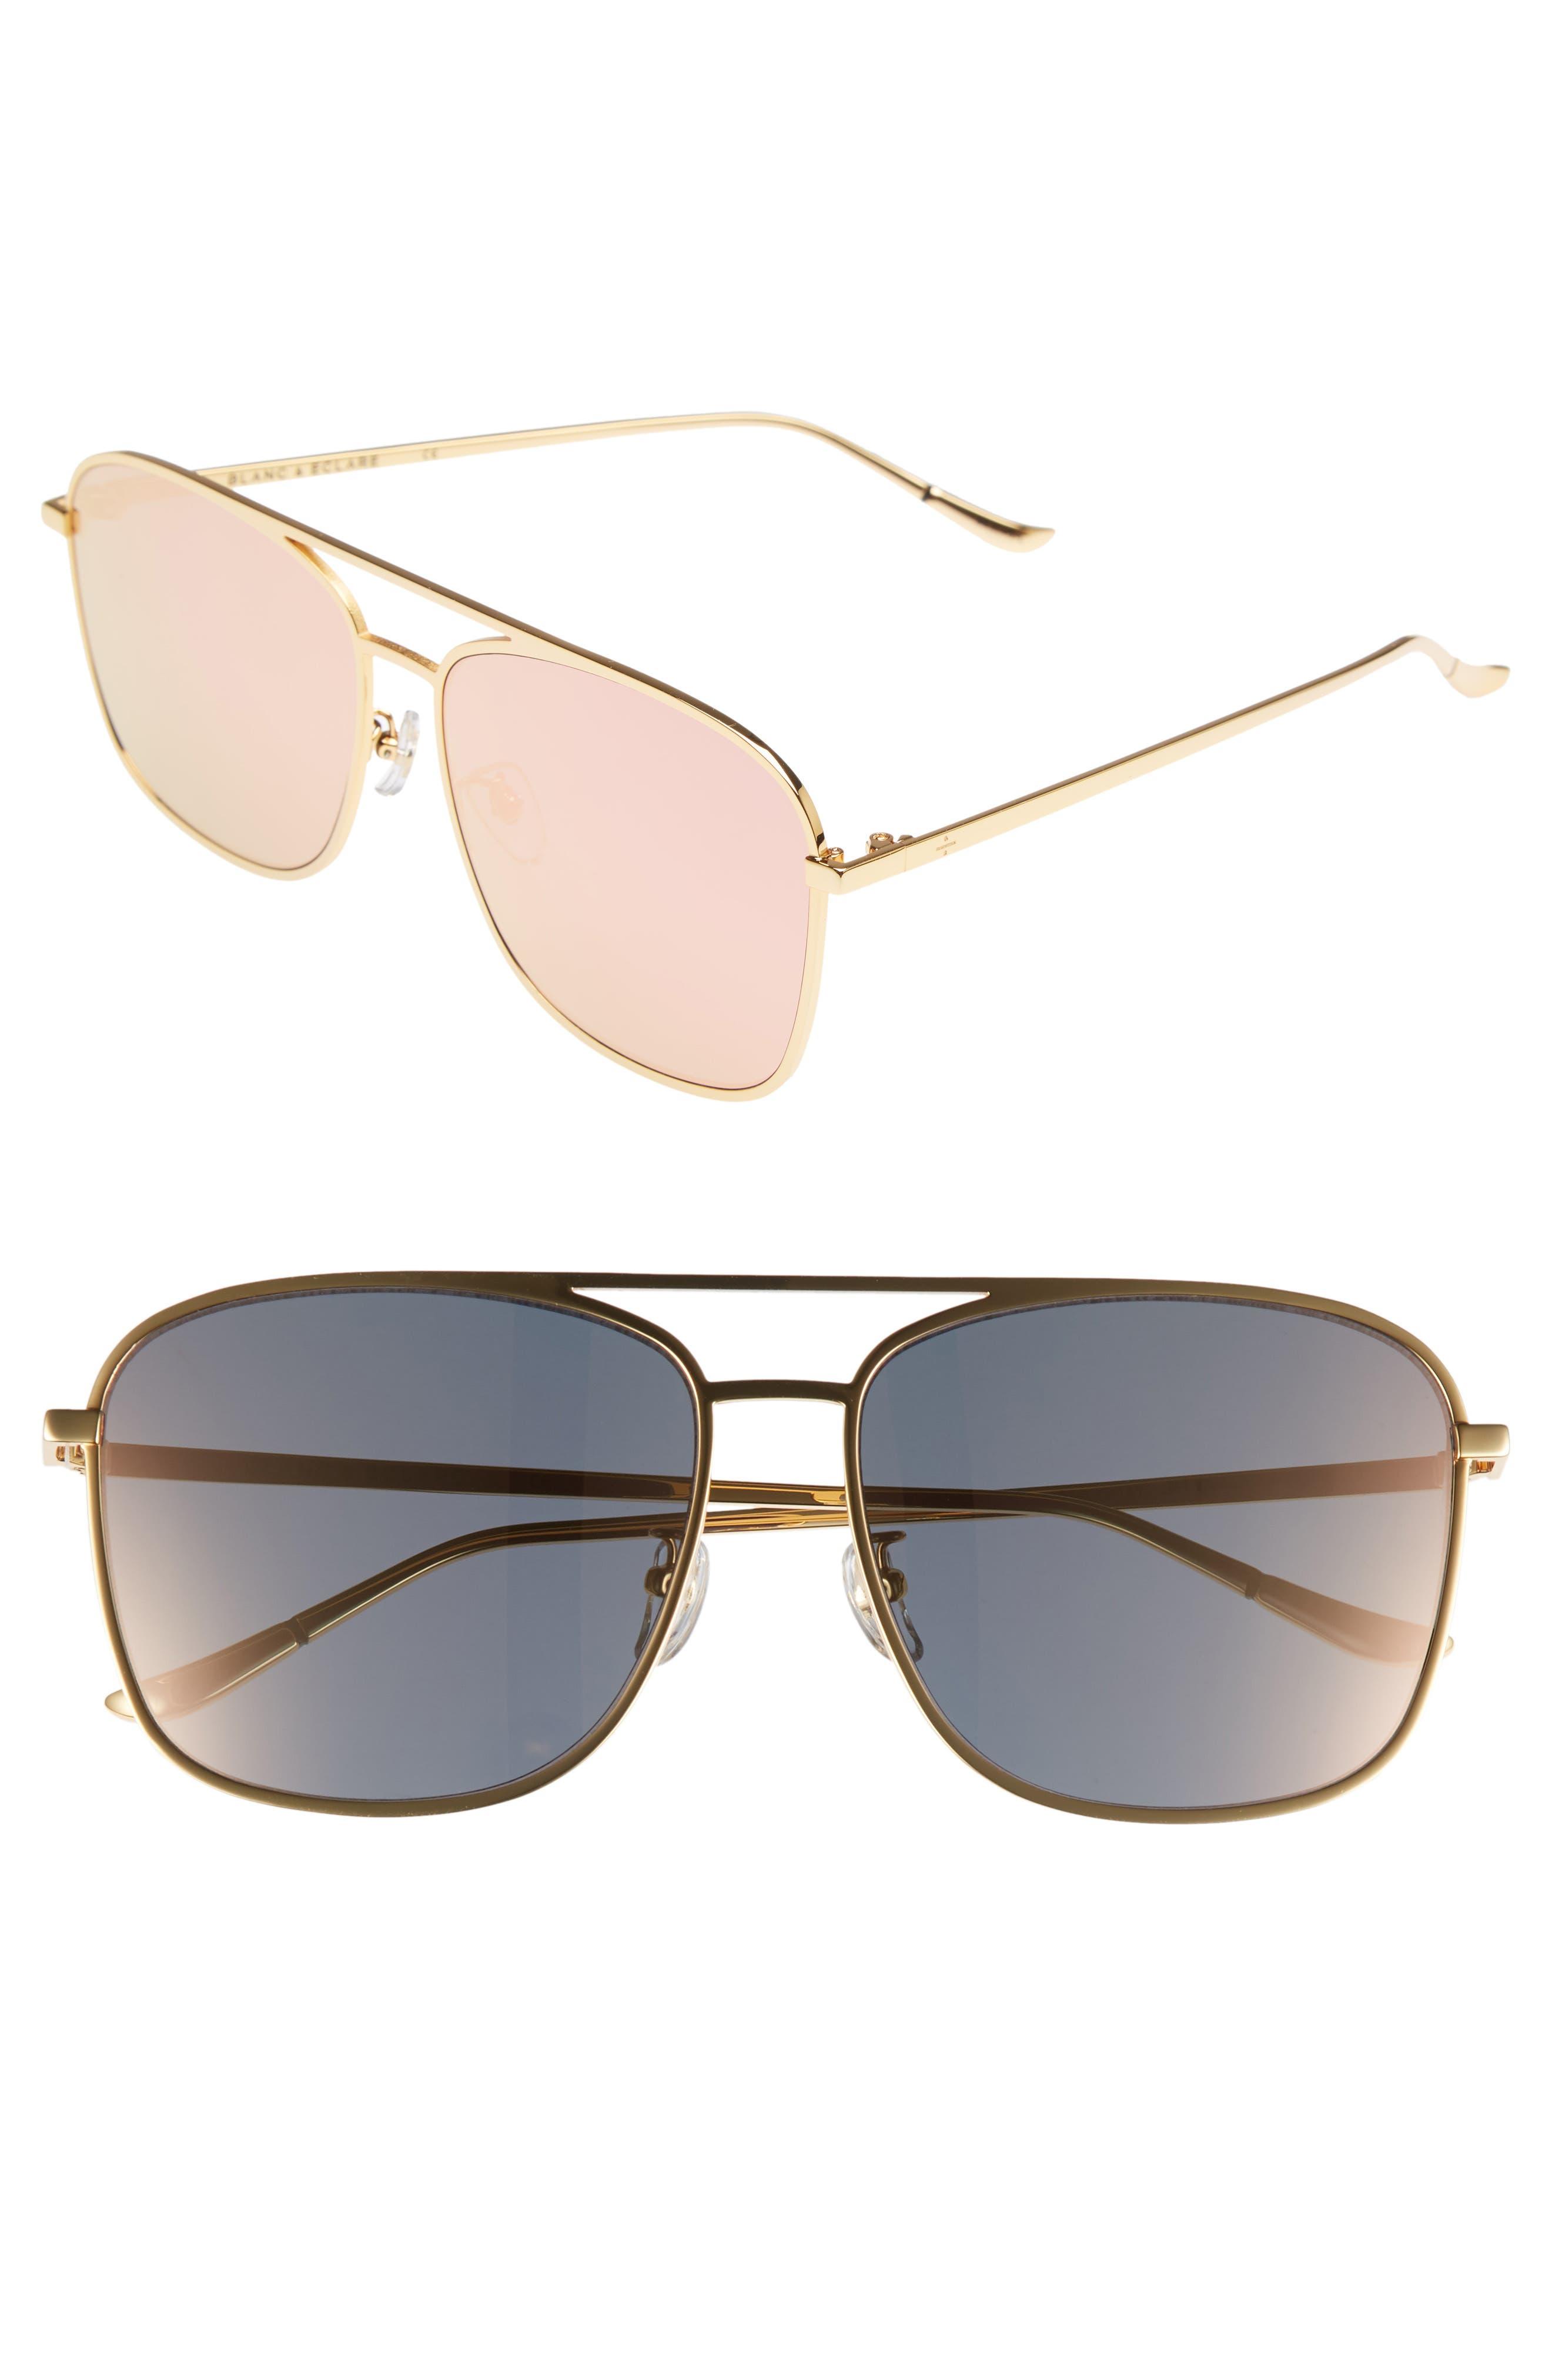 BLANC & ECLARE Geneva 61mm Large Polarized Metal Aviator Sunglasses,                         Main,                         color, 710